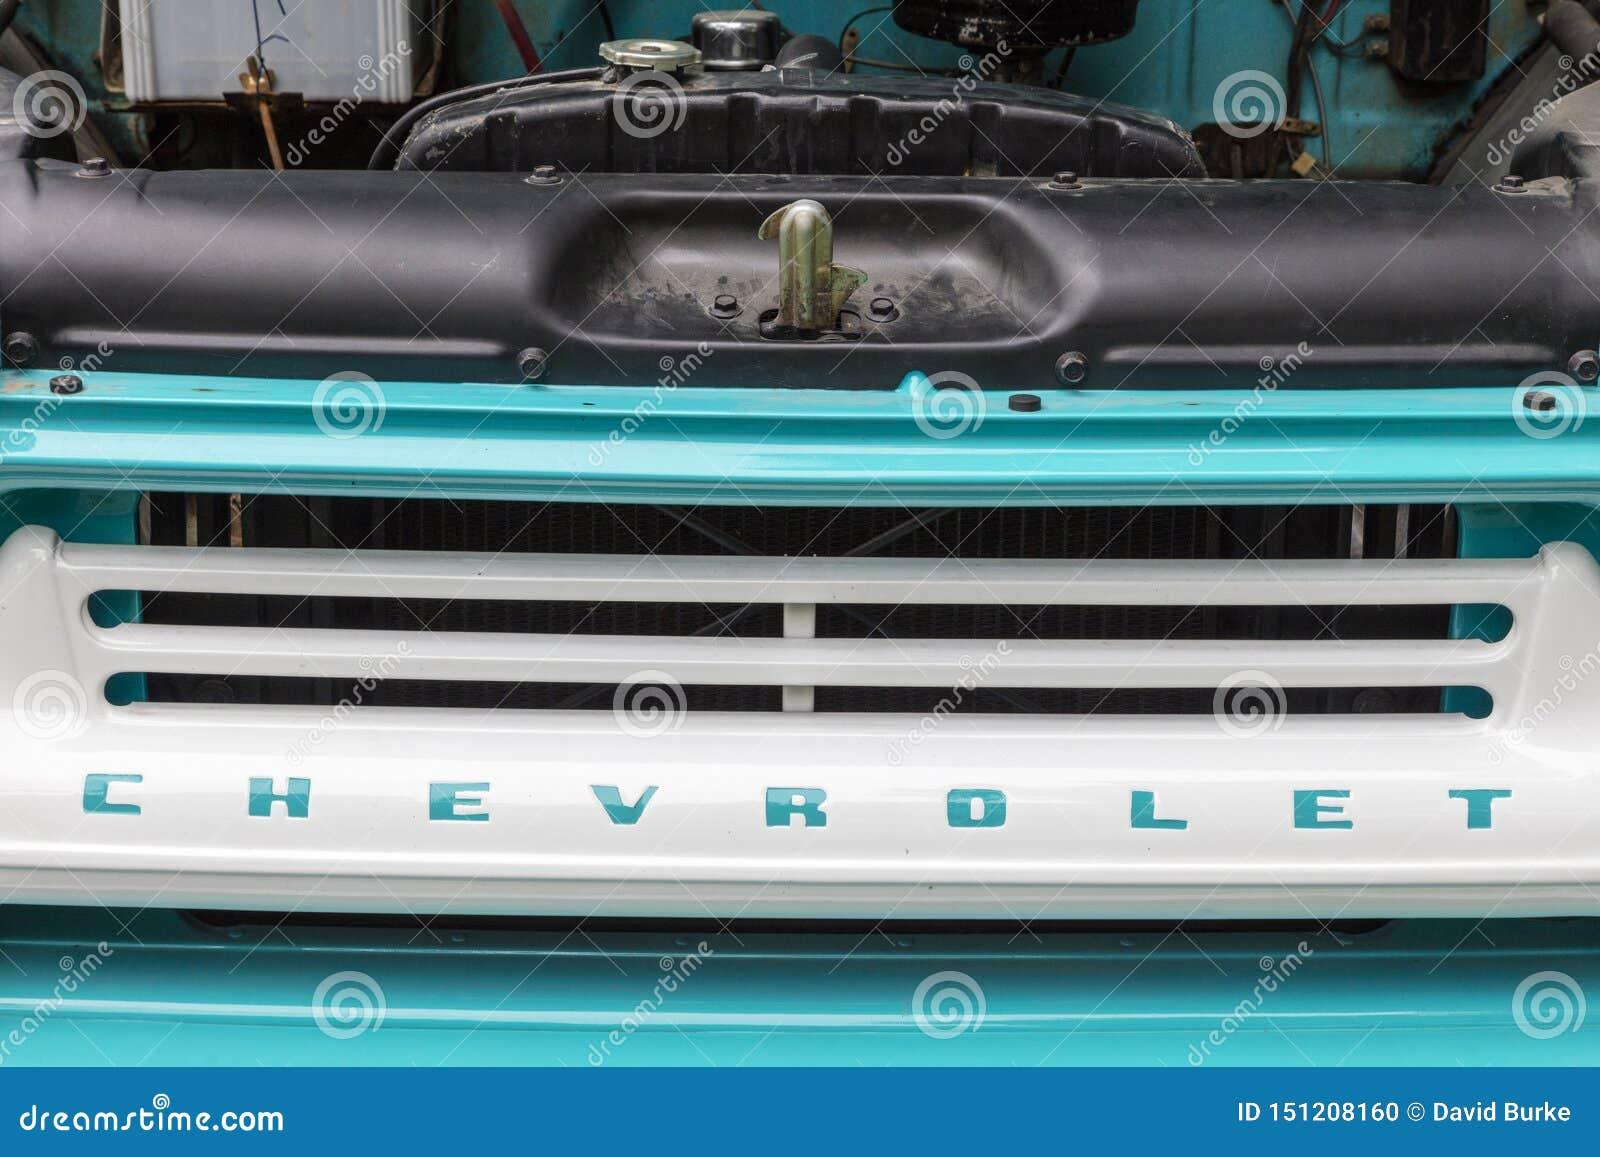 Parrilla pintada camioneta pickup vieja de Chevrolet 1959